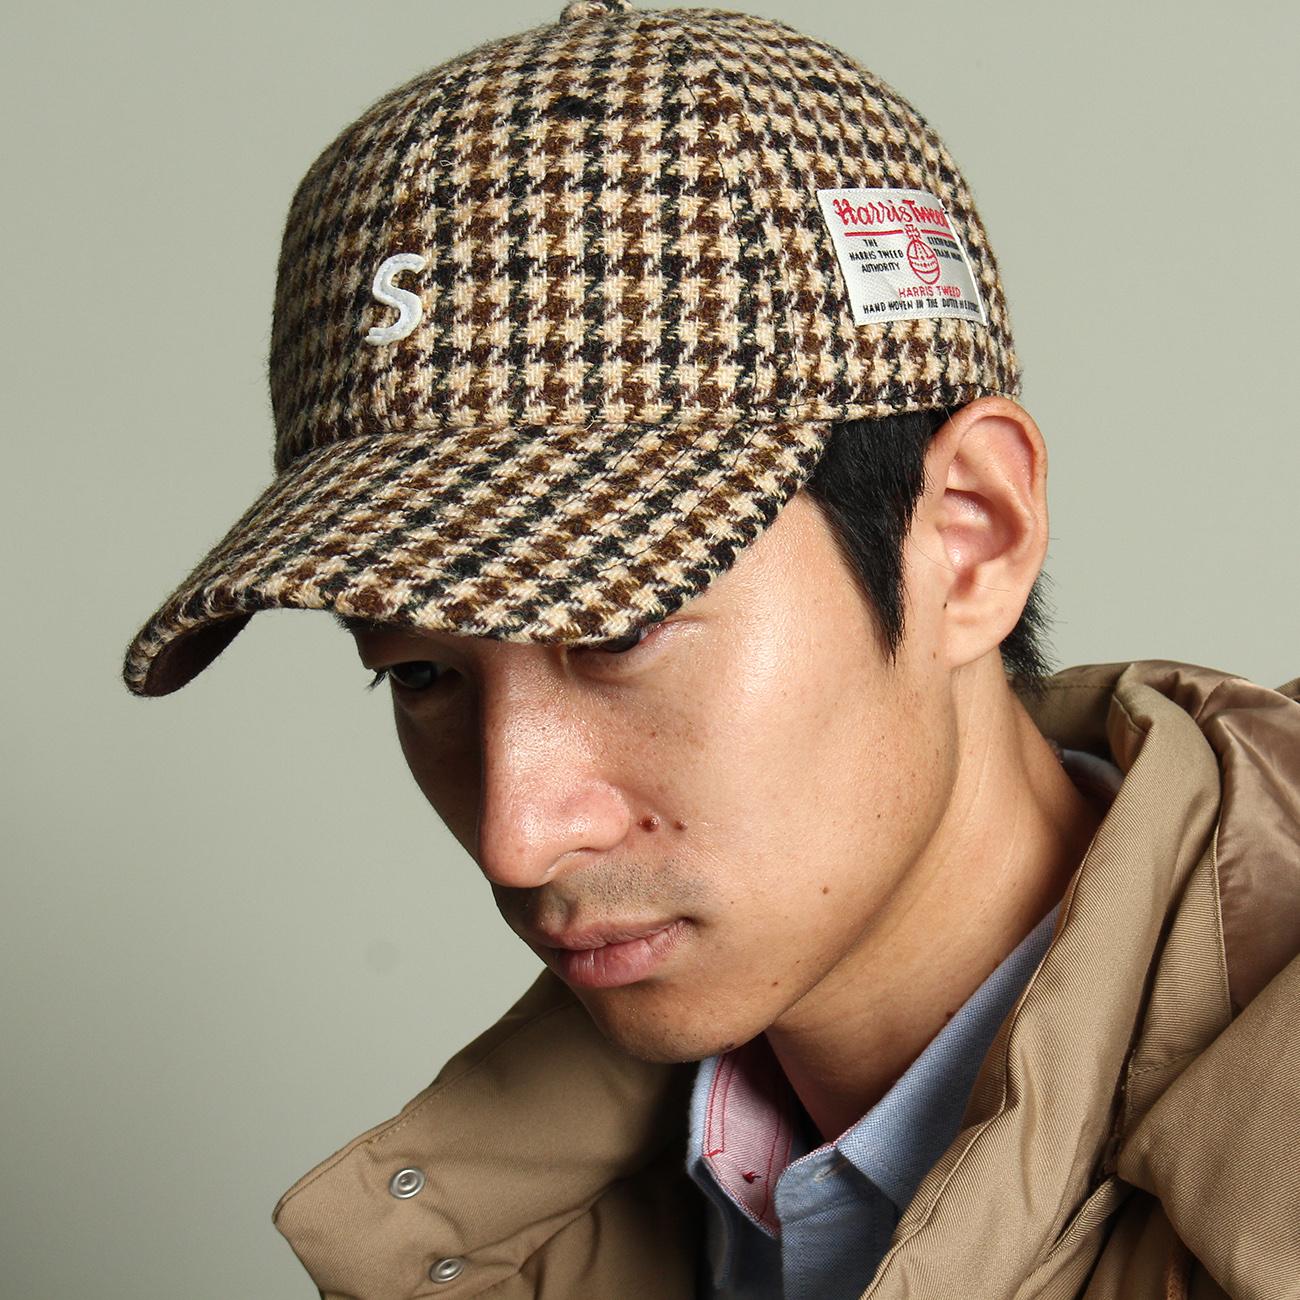 【THE SHOP TK(Men) (ザ ショップ ティーケー(メンズ))】ハリスツイードローCAPメンズ 帽子|キャップ ベージュ系